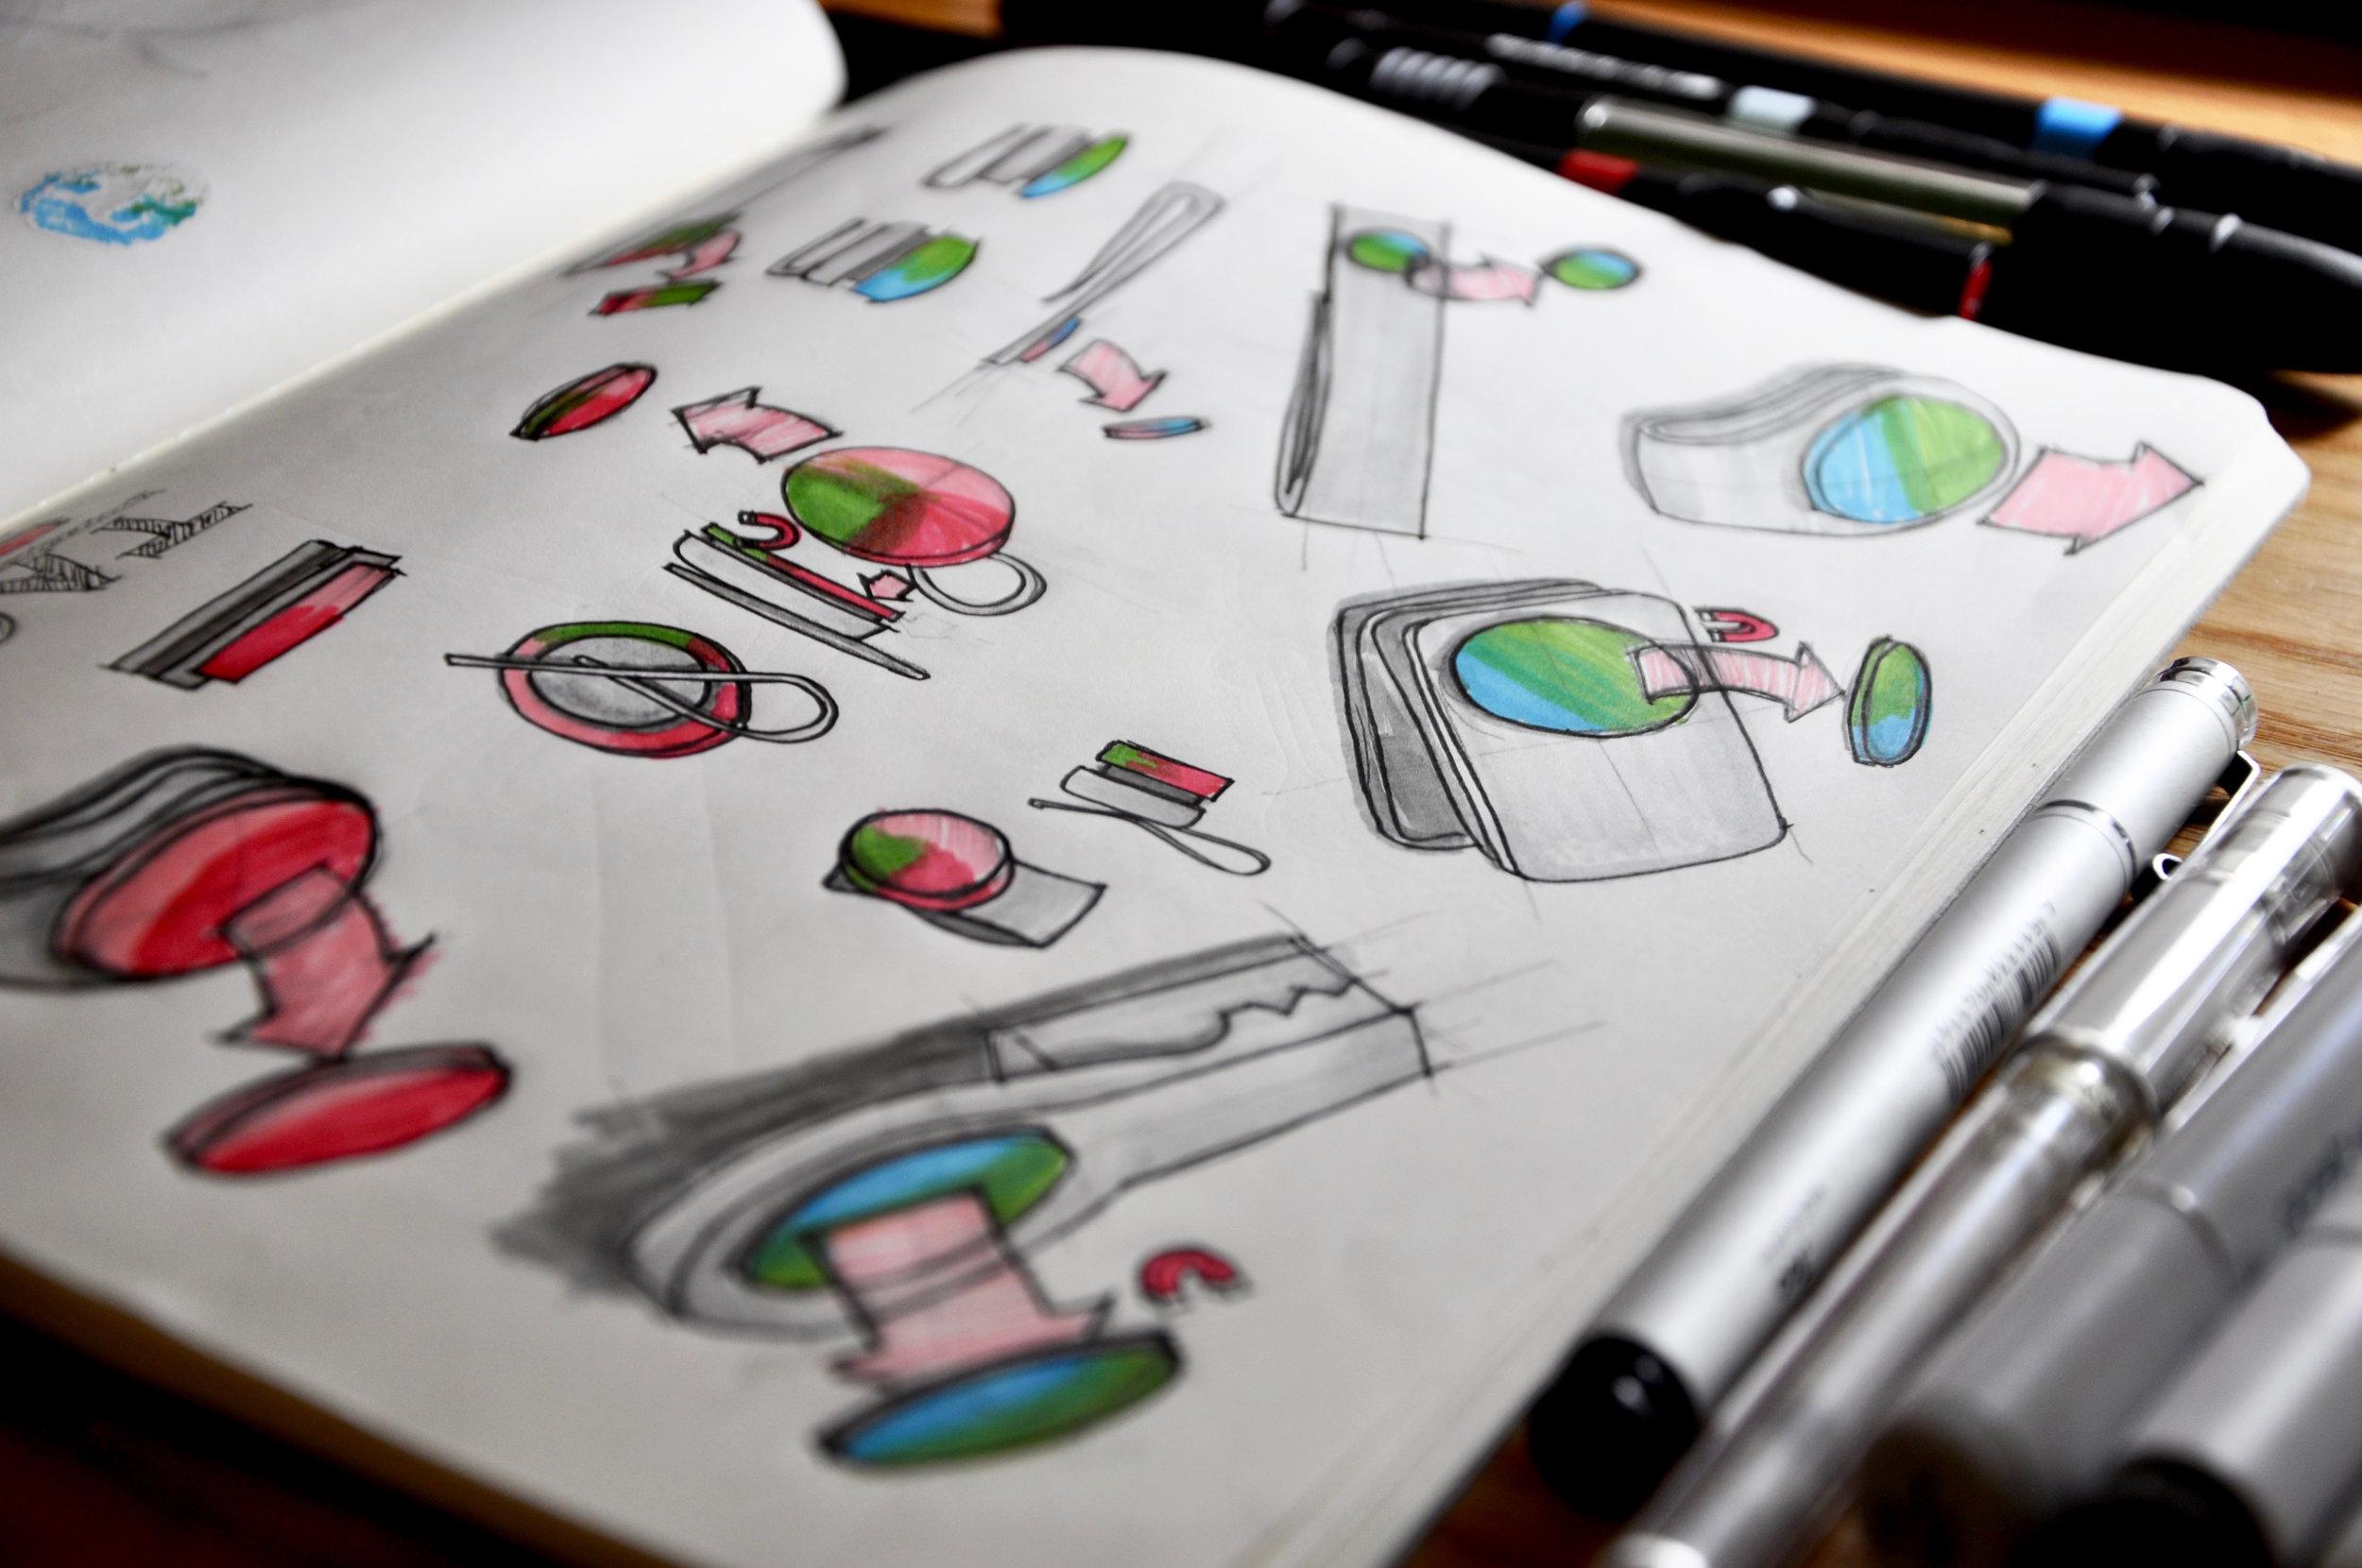 Sketches by Mary Tsai